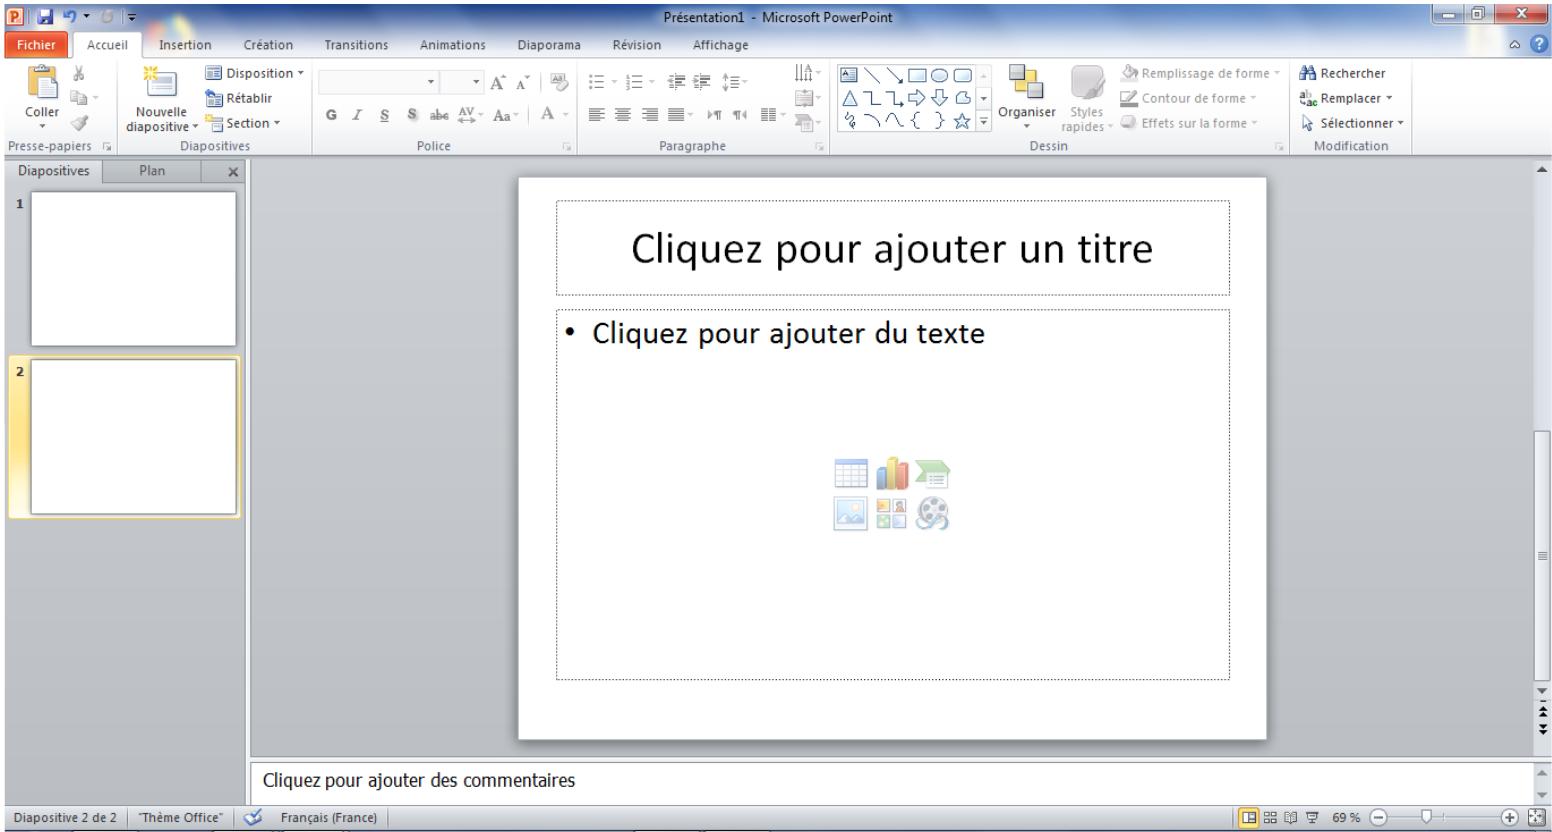 L'interface de Microsoft PowerPoint